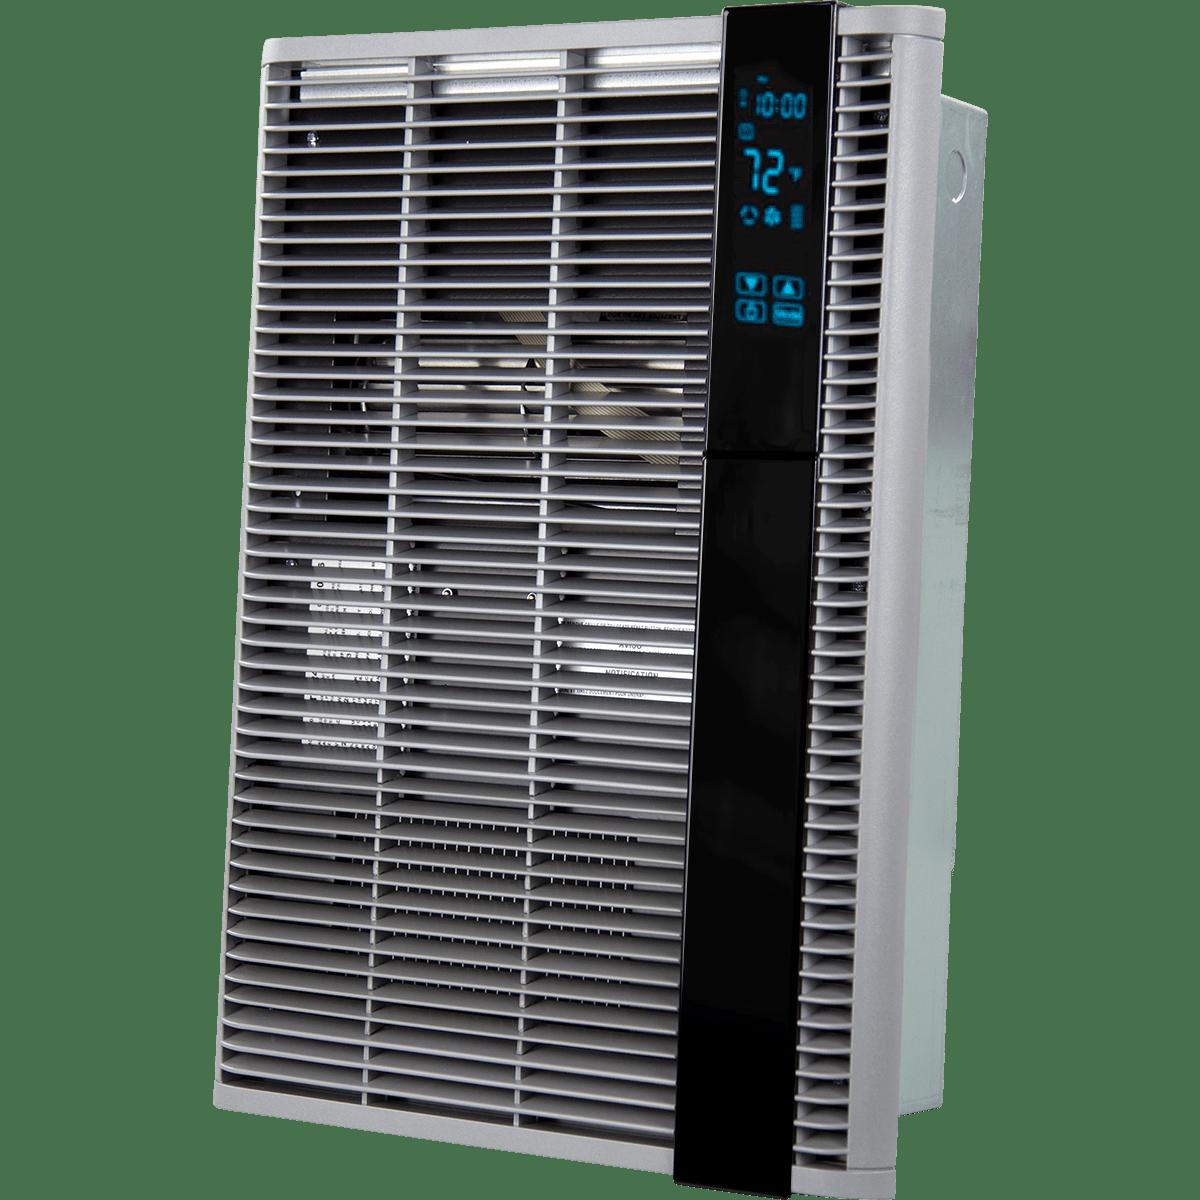 QMark HT Smart Series 120V Programmable Digital Wall Heater